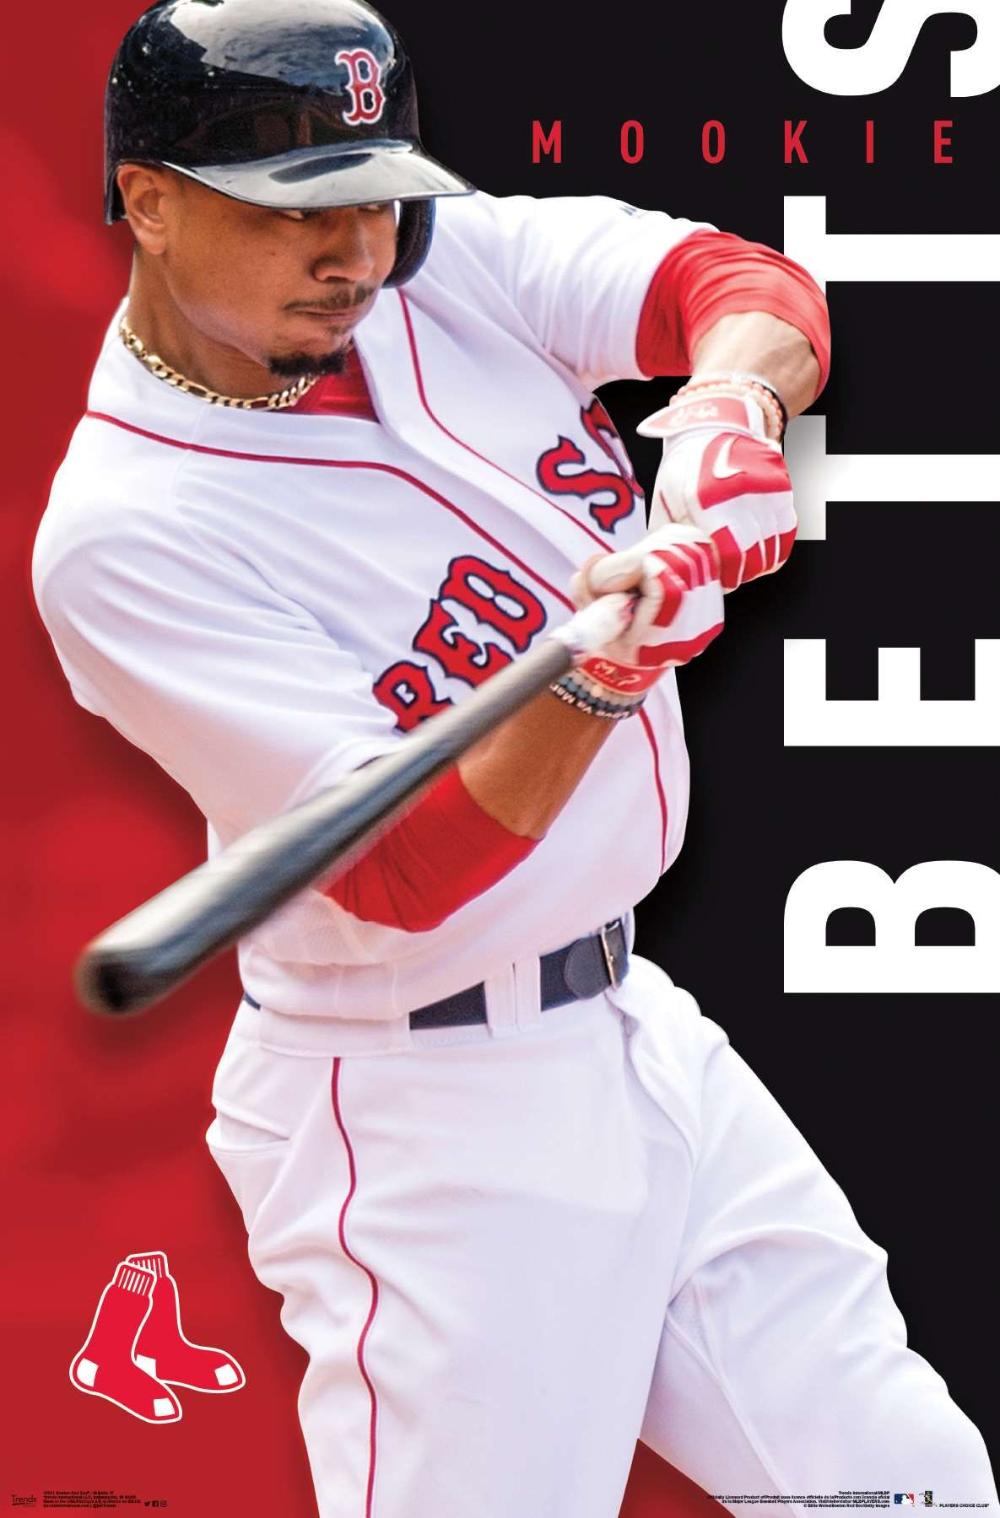 Mlb Boston Red Sox Mookie Betts Red Sox Nation Boston Red Sox Red Sox Baseball